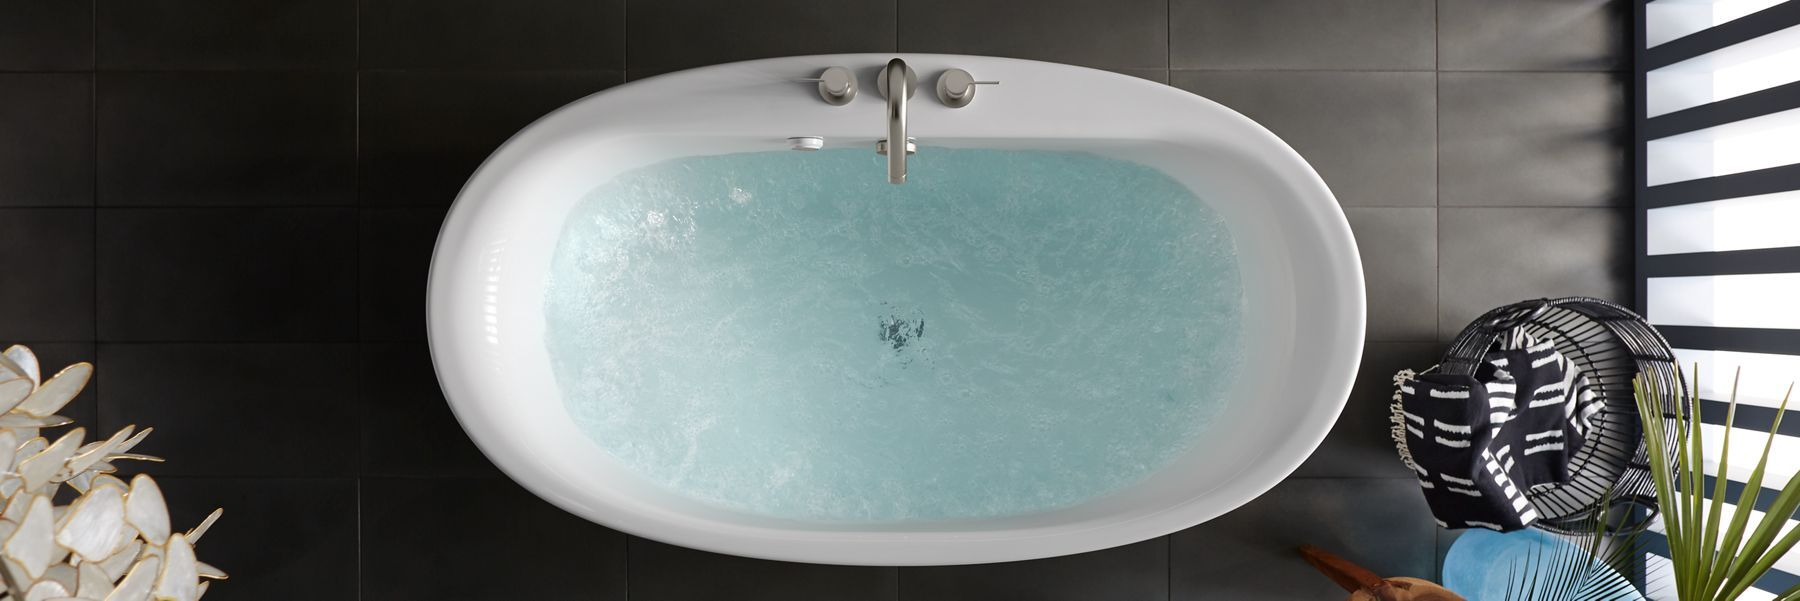 Freestanding Baths Kohler Free Standing Bath Bath Trends